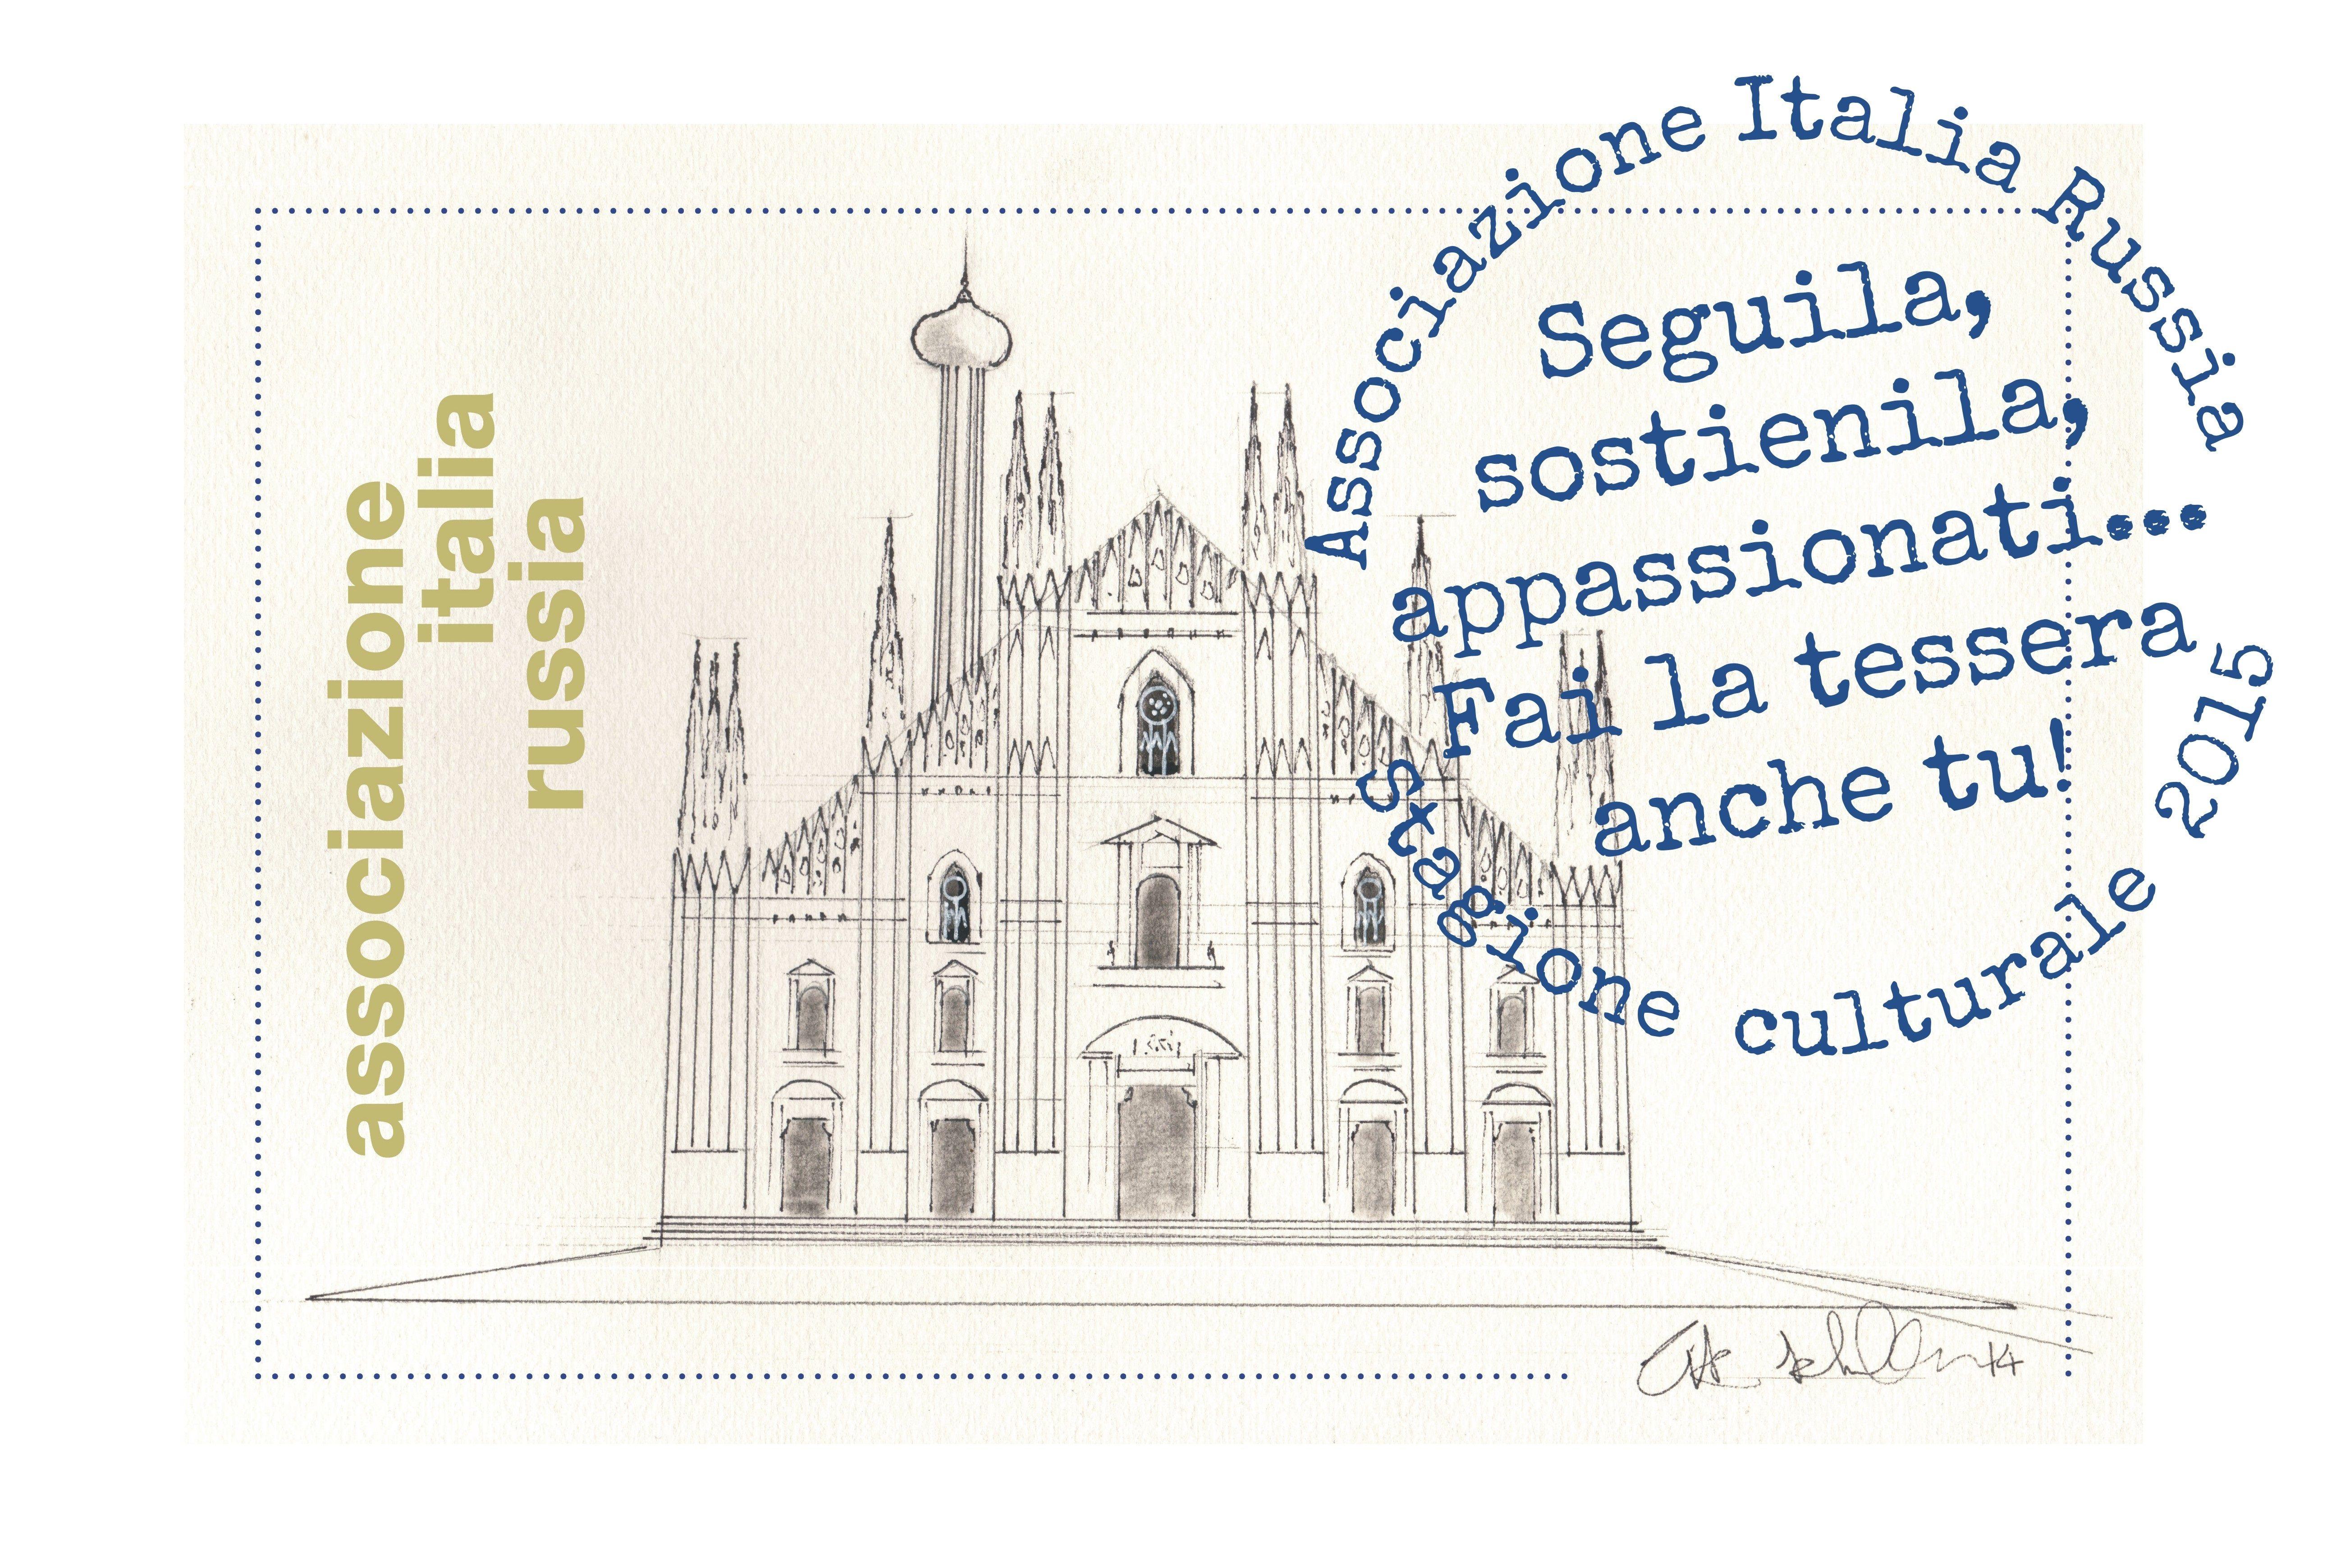 Per saperne di più sulle nostre convenzioni: http://www.associazioneitaliarussia.it/russimi/